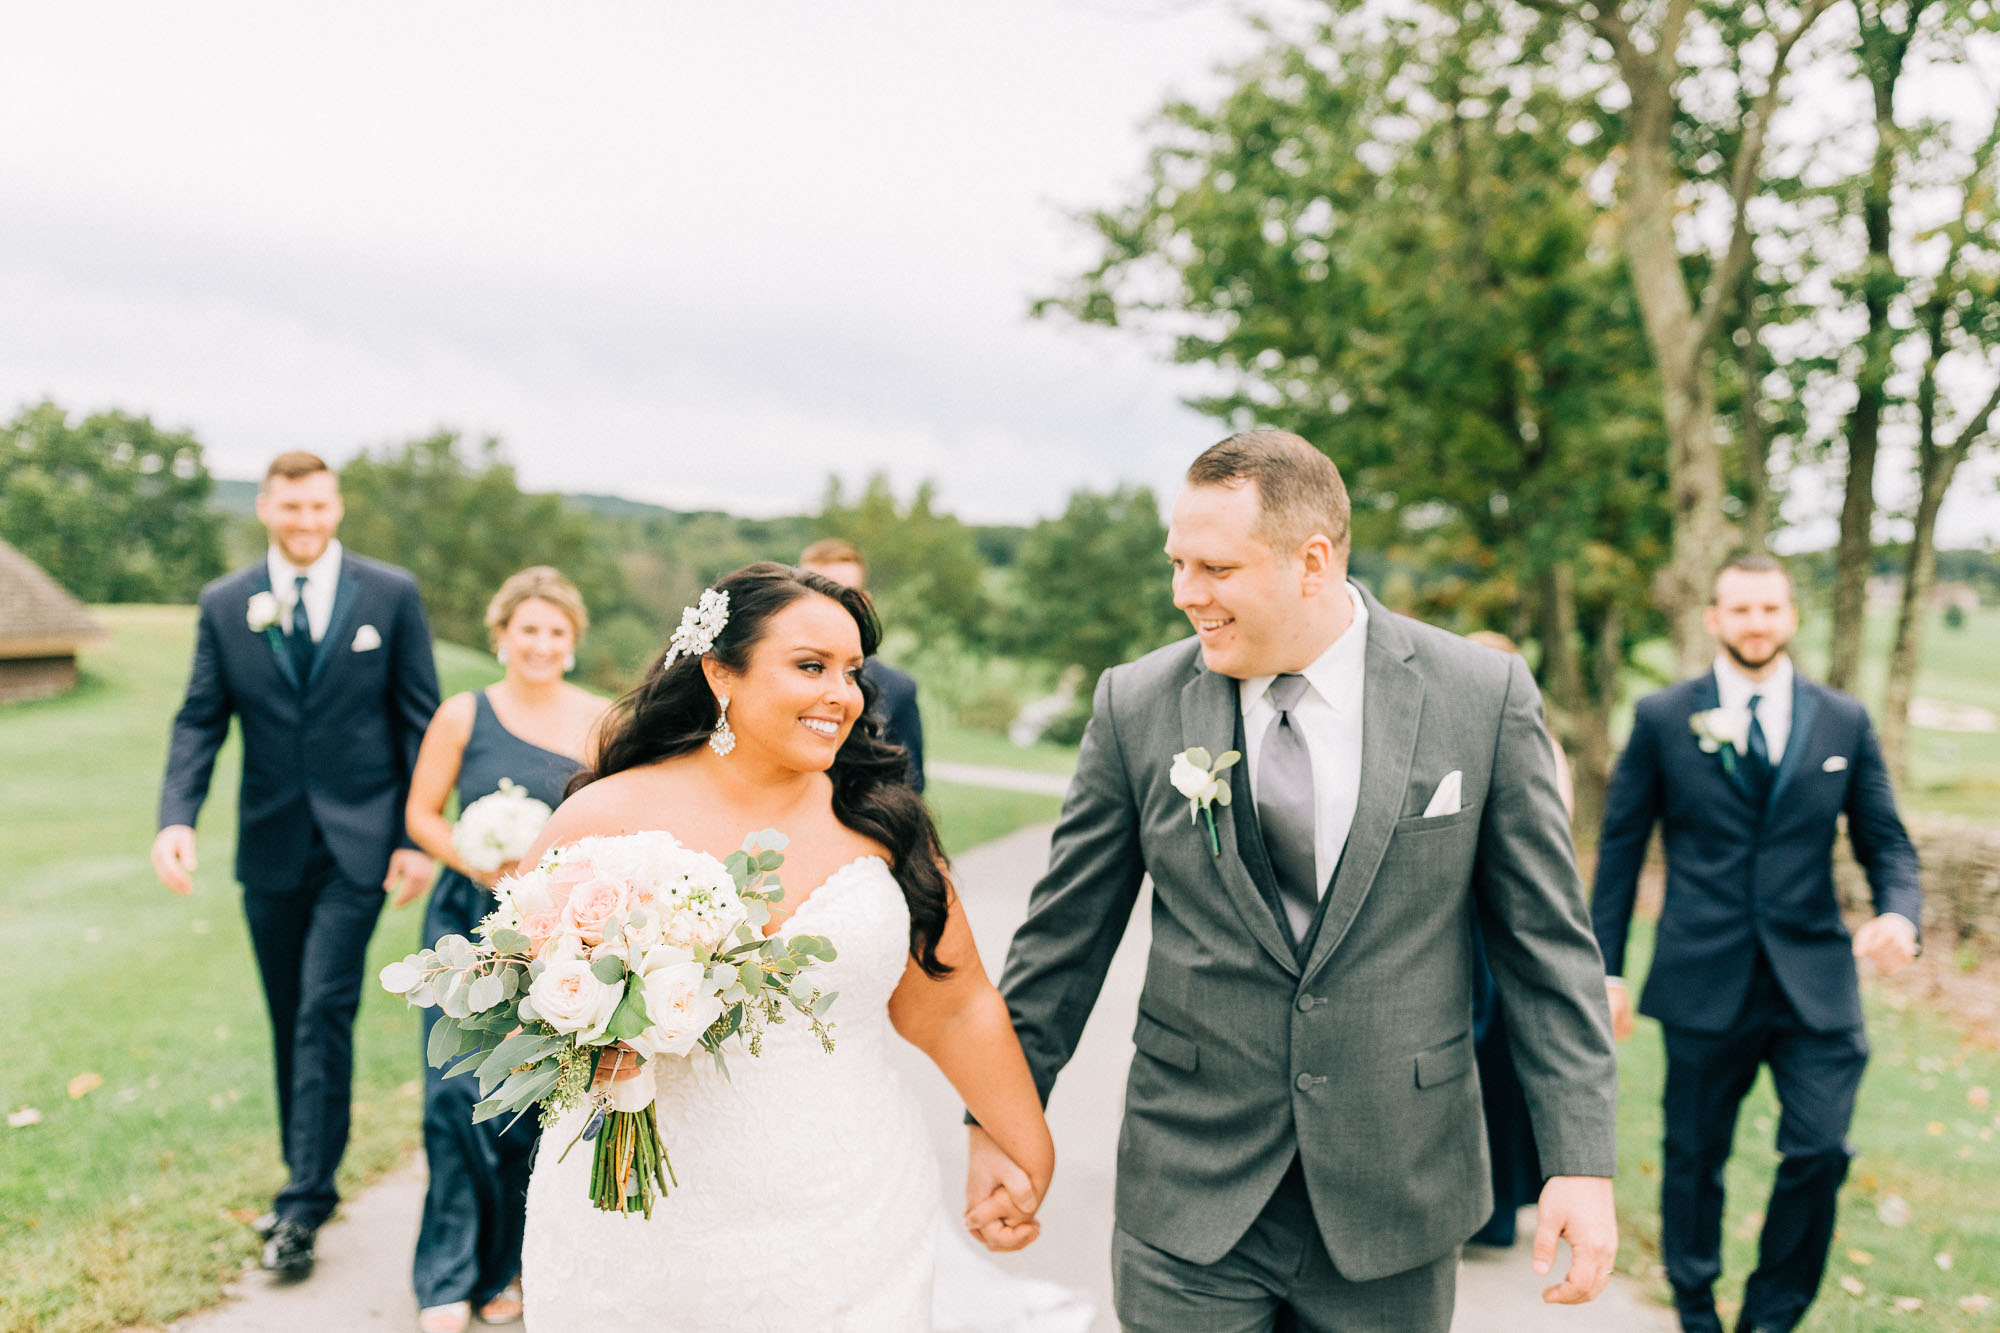 stonhedge-country-club-wedding-3127.jpg